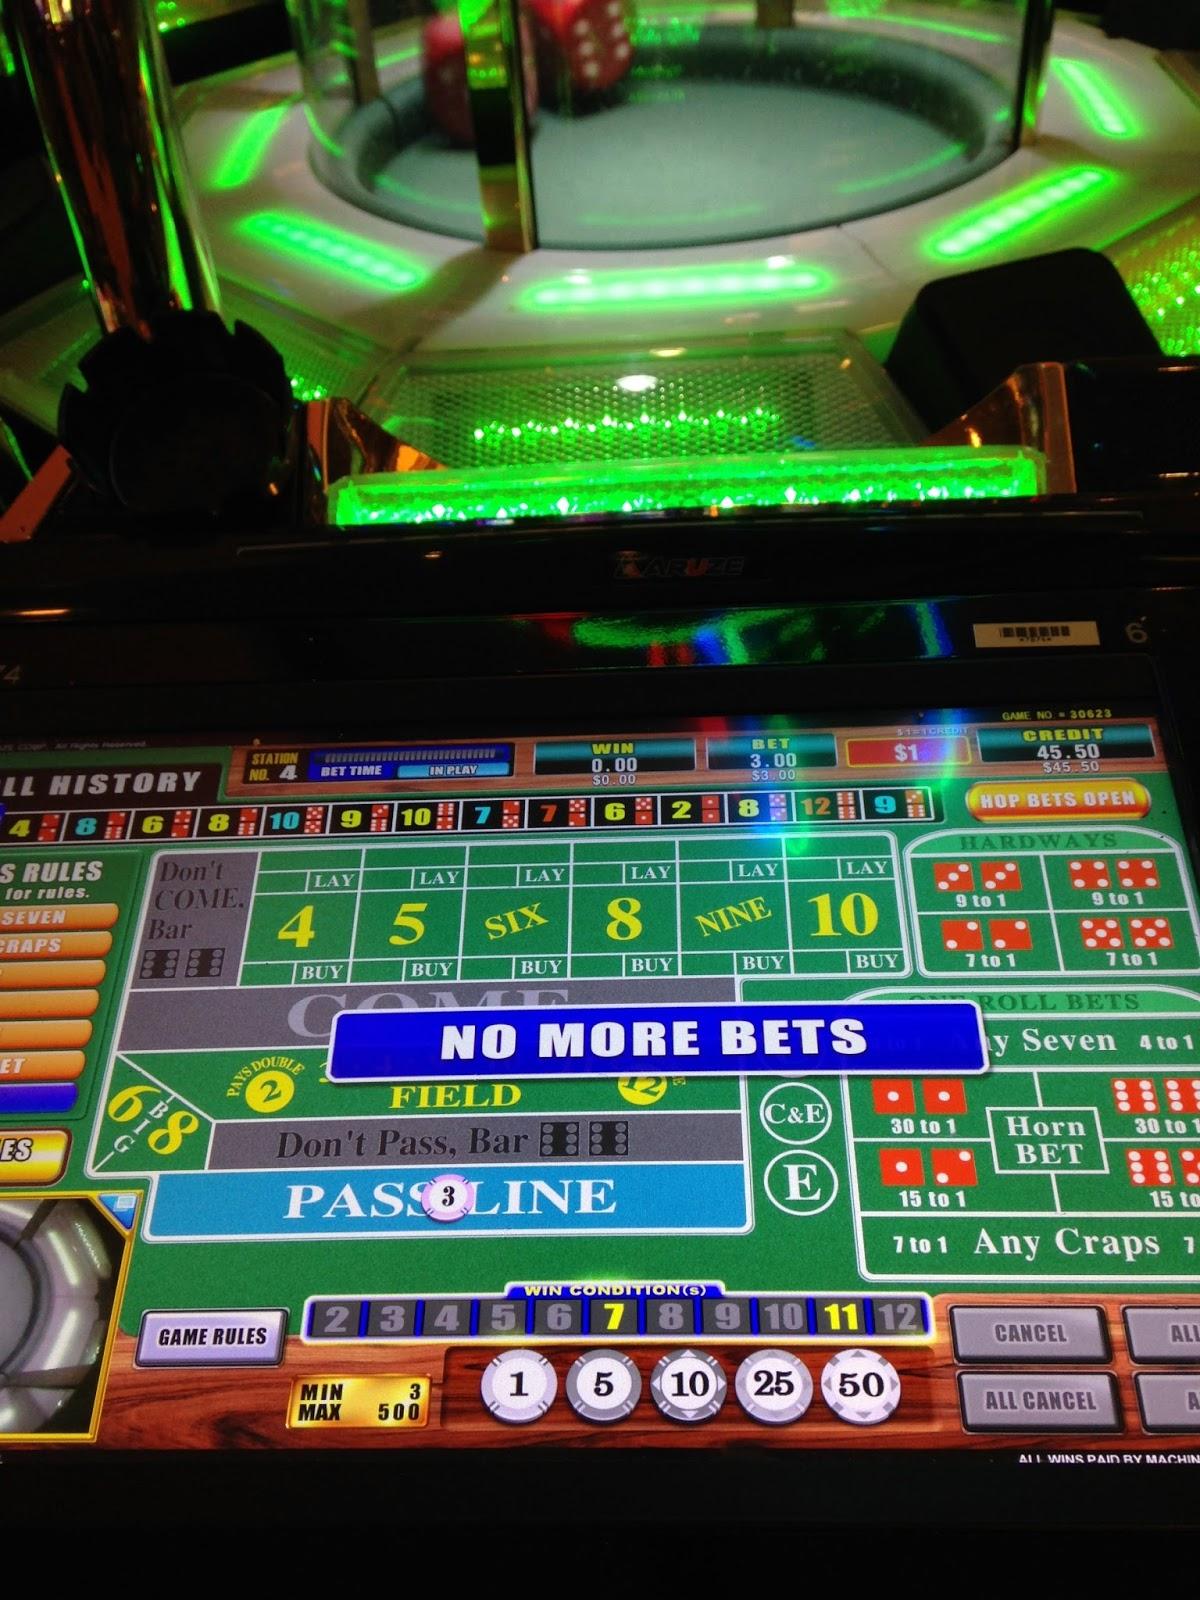 Pop o matic craps betting contrarian betting espn3